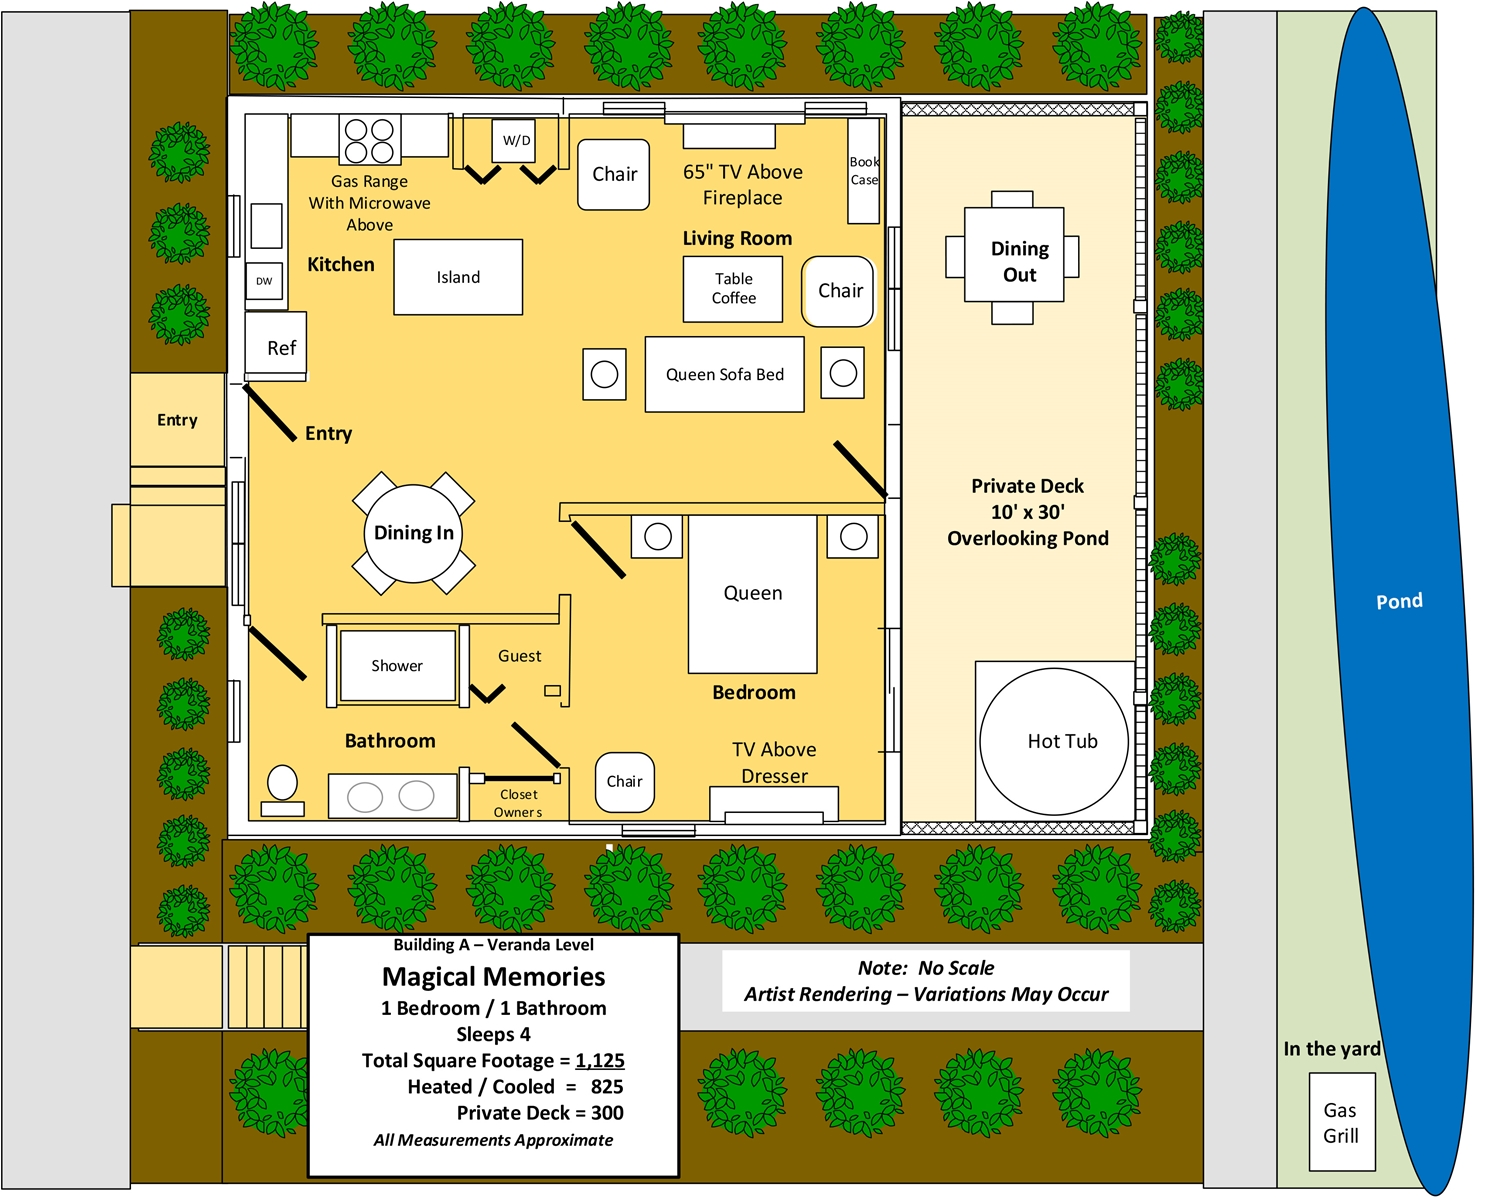 Floor Plan for Magical Memories